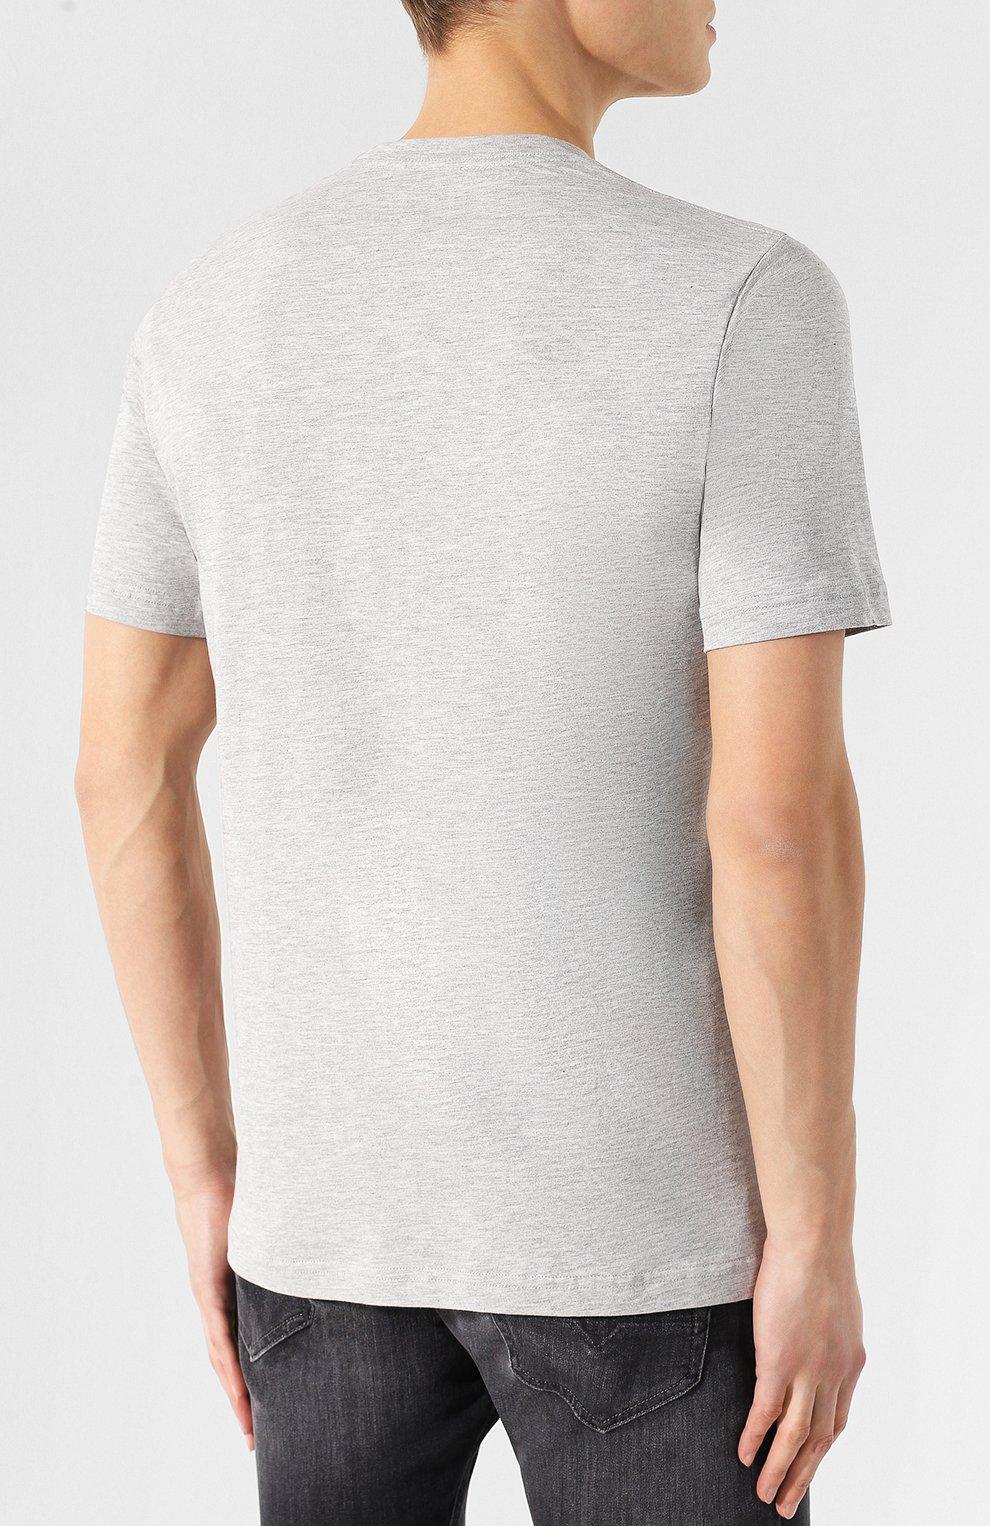 Хлопковая футболка  Diesel серая   Фото №4